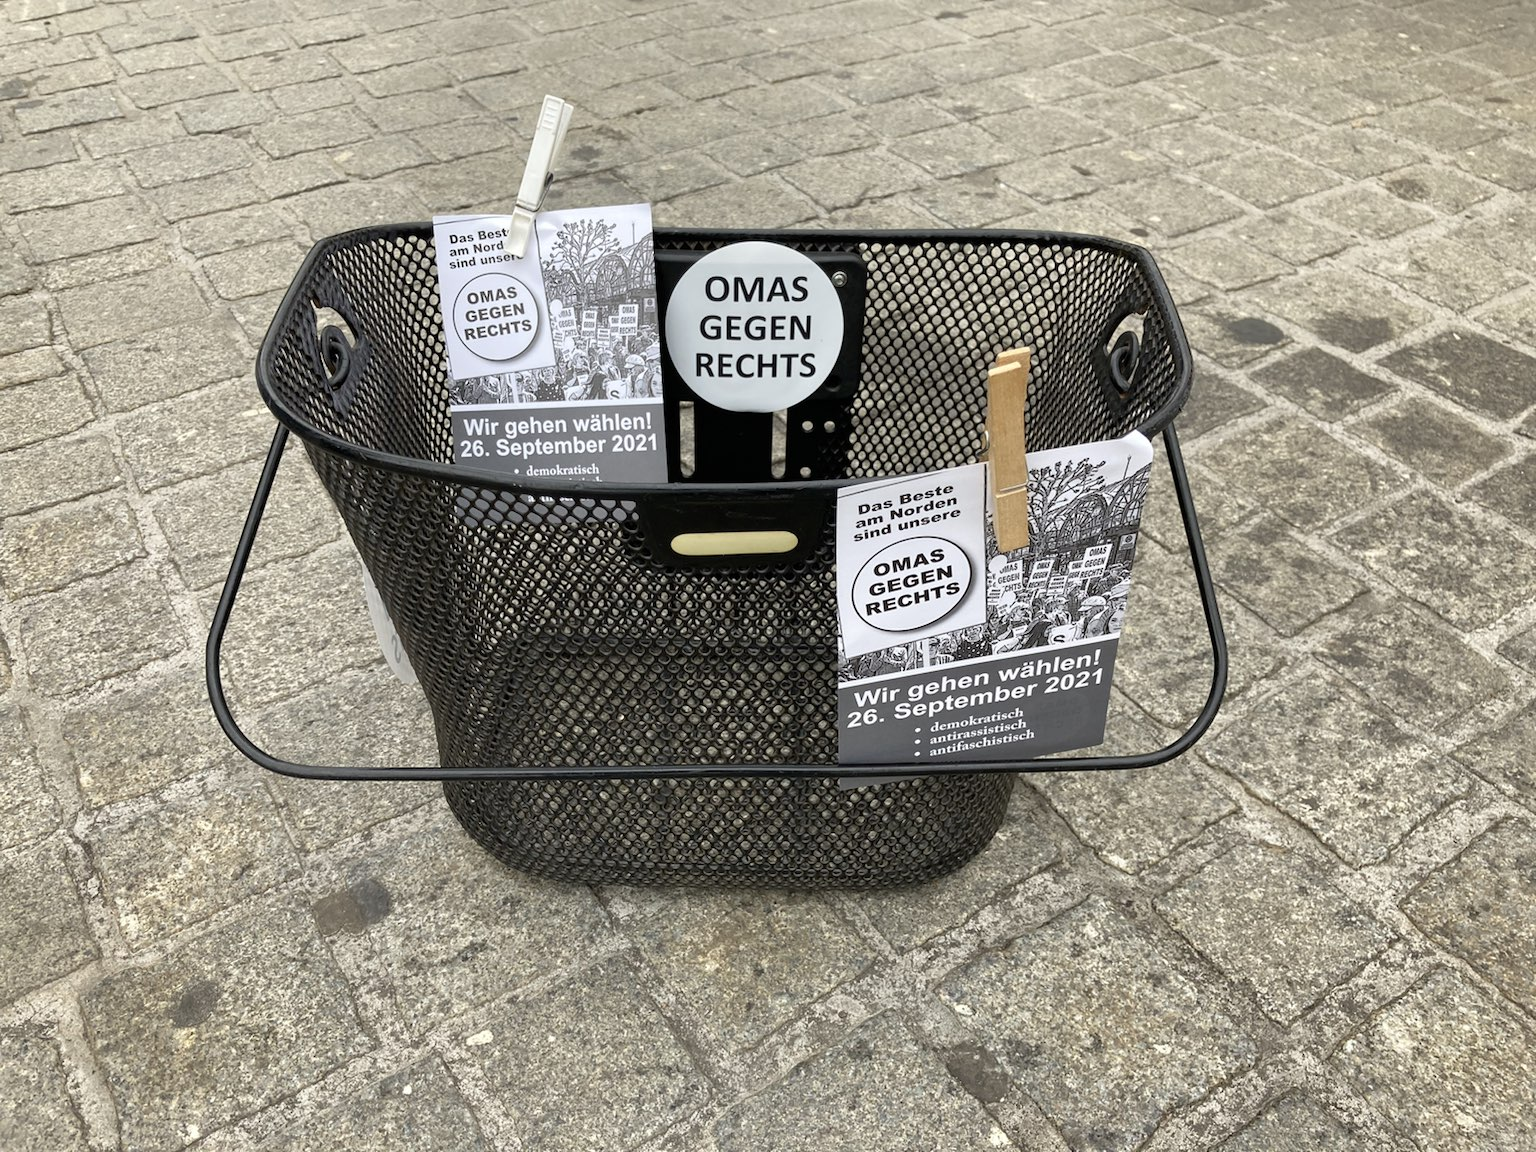 Bremen: 3. Wahlaktion der Bremer Omas 19.7.2021